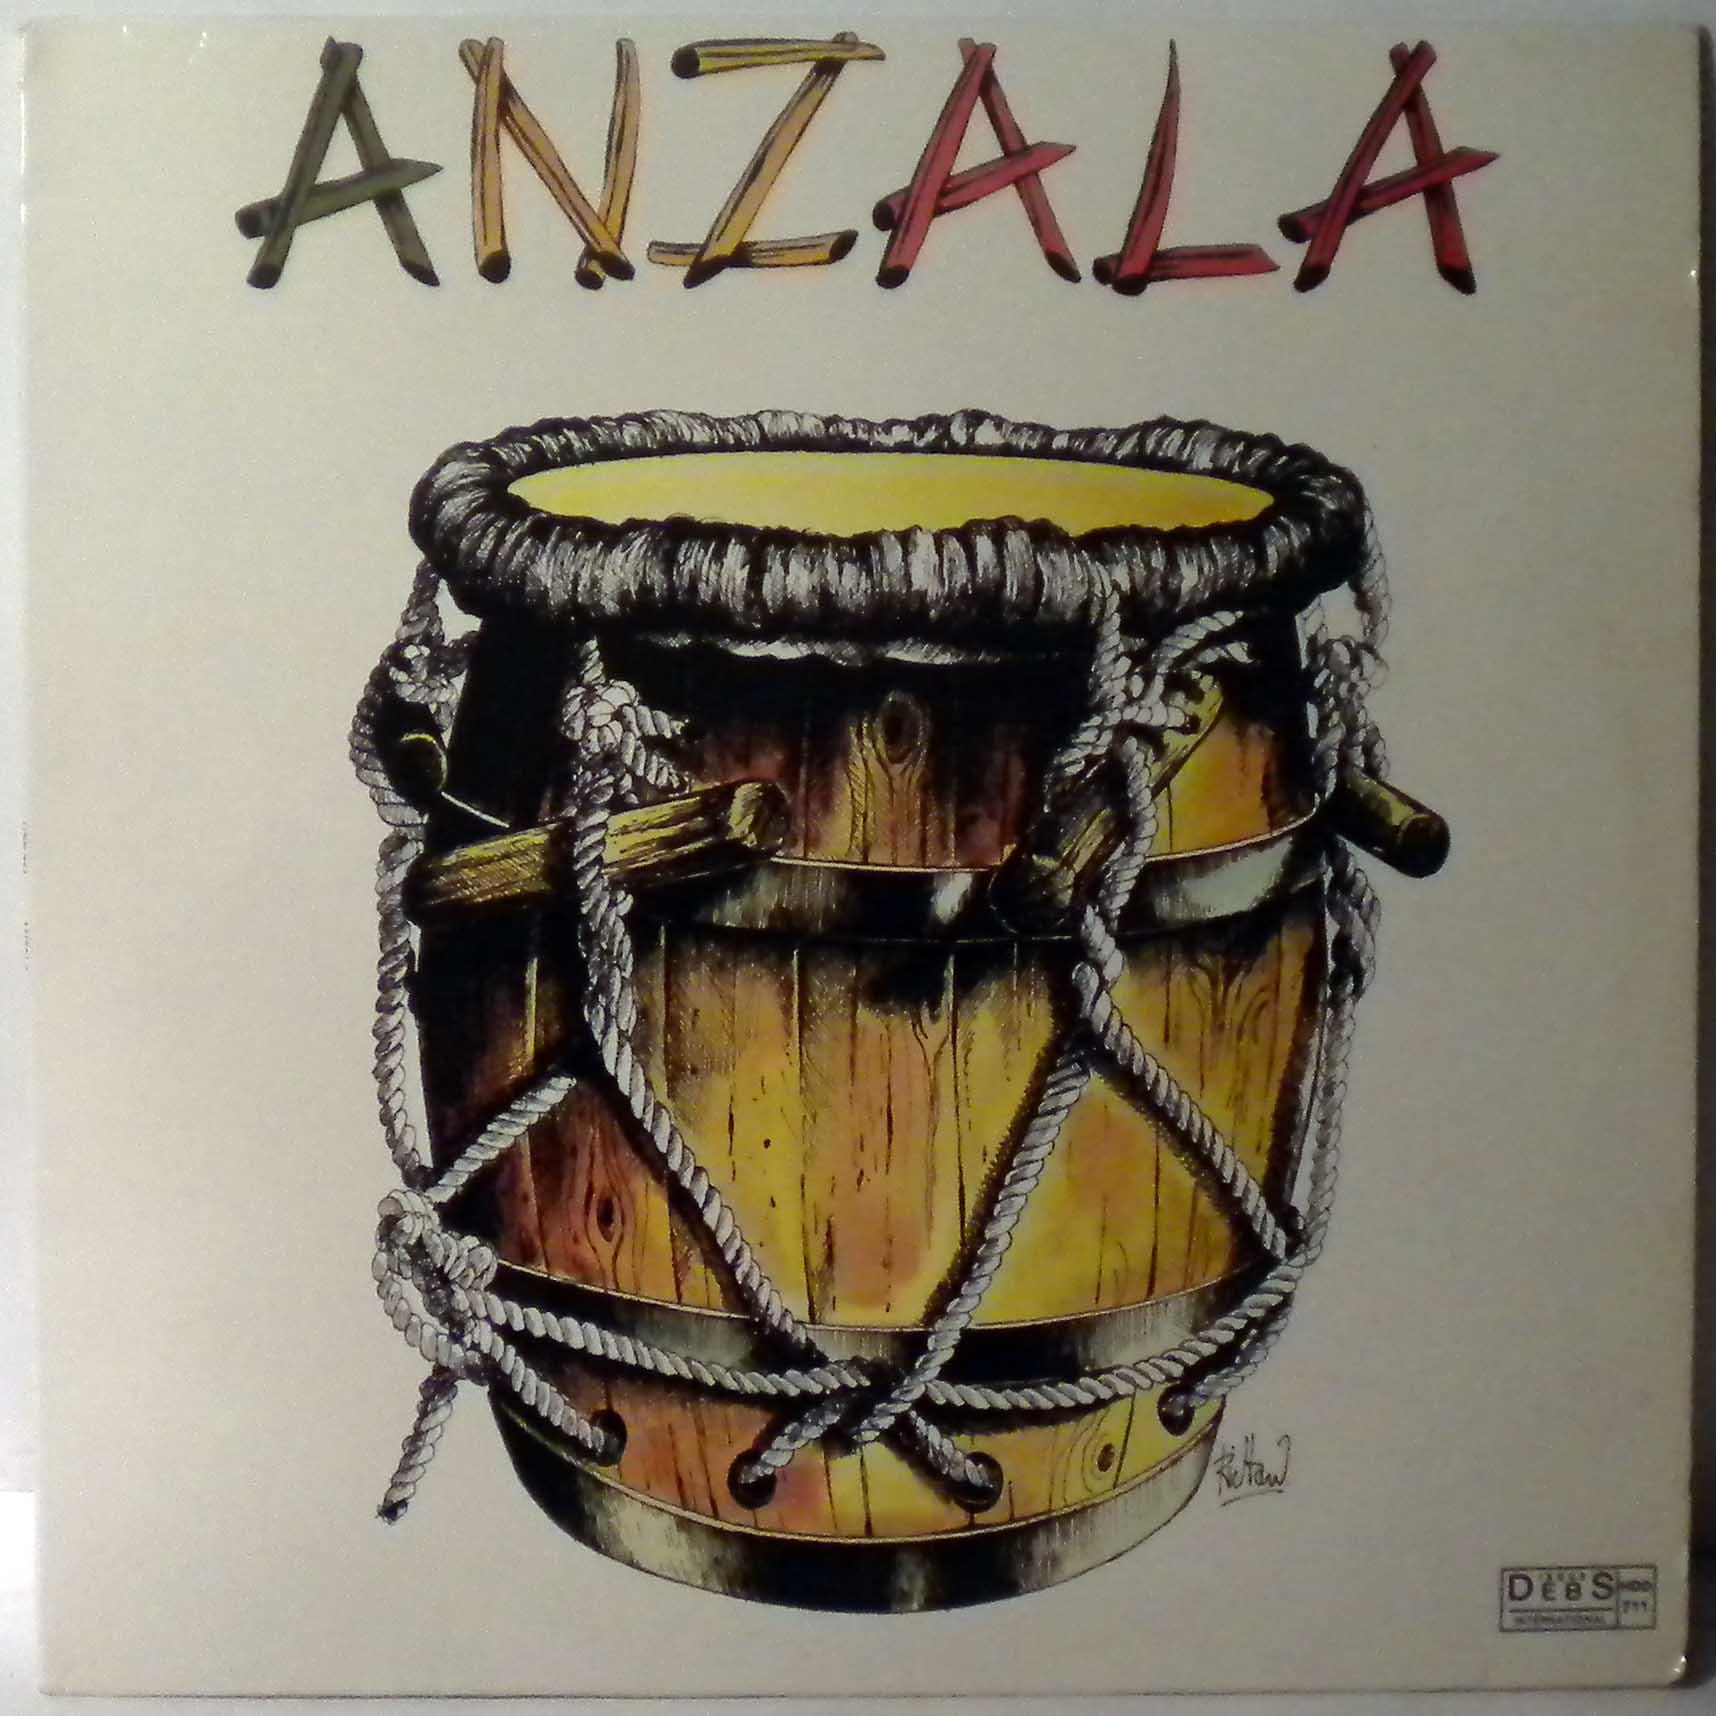 ANZALA - Same - 33T